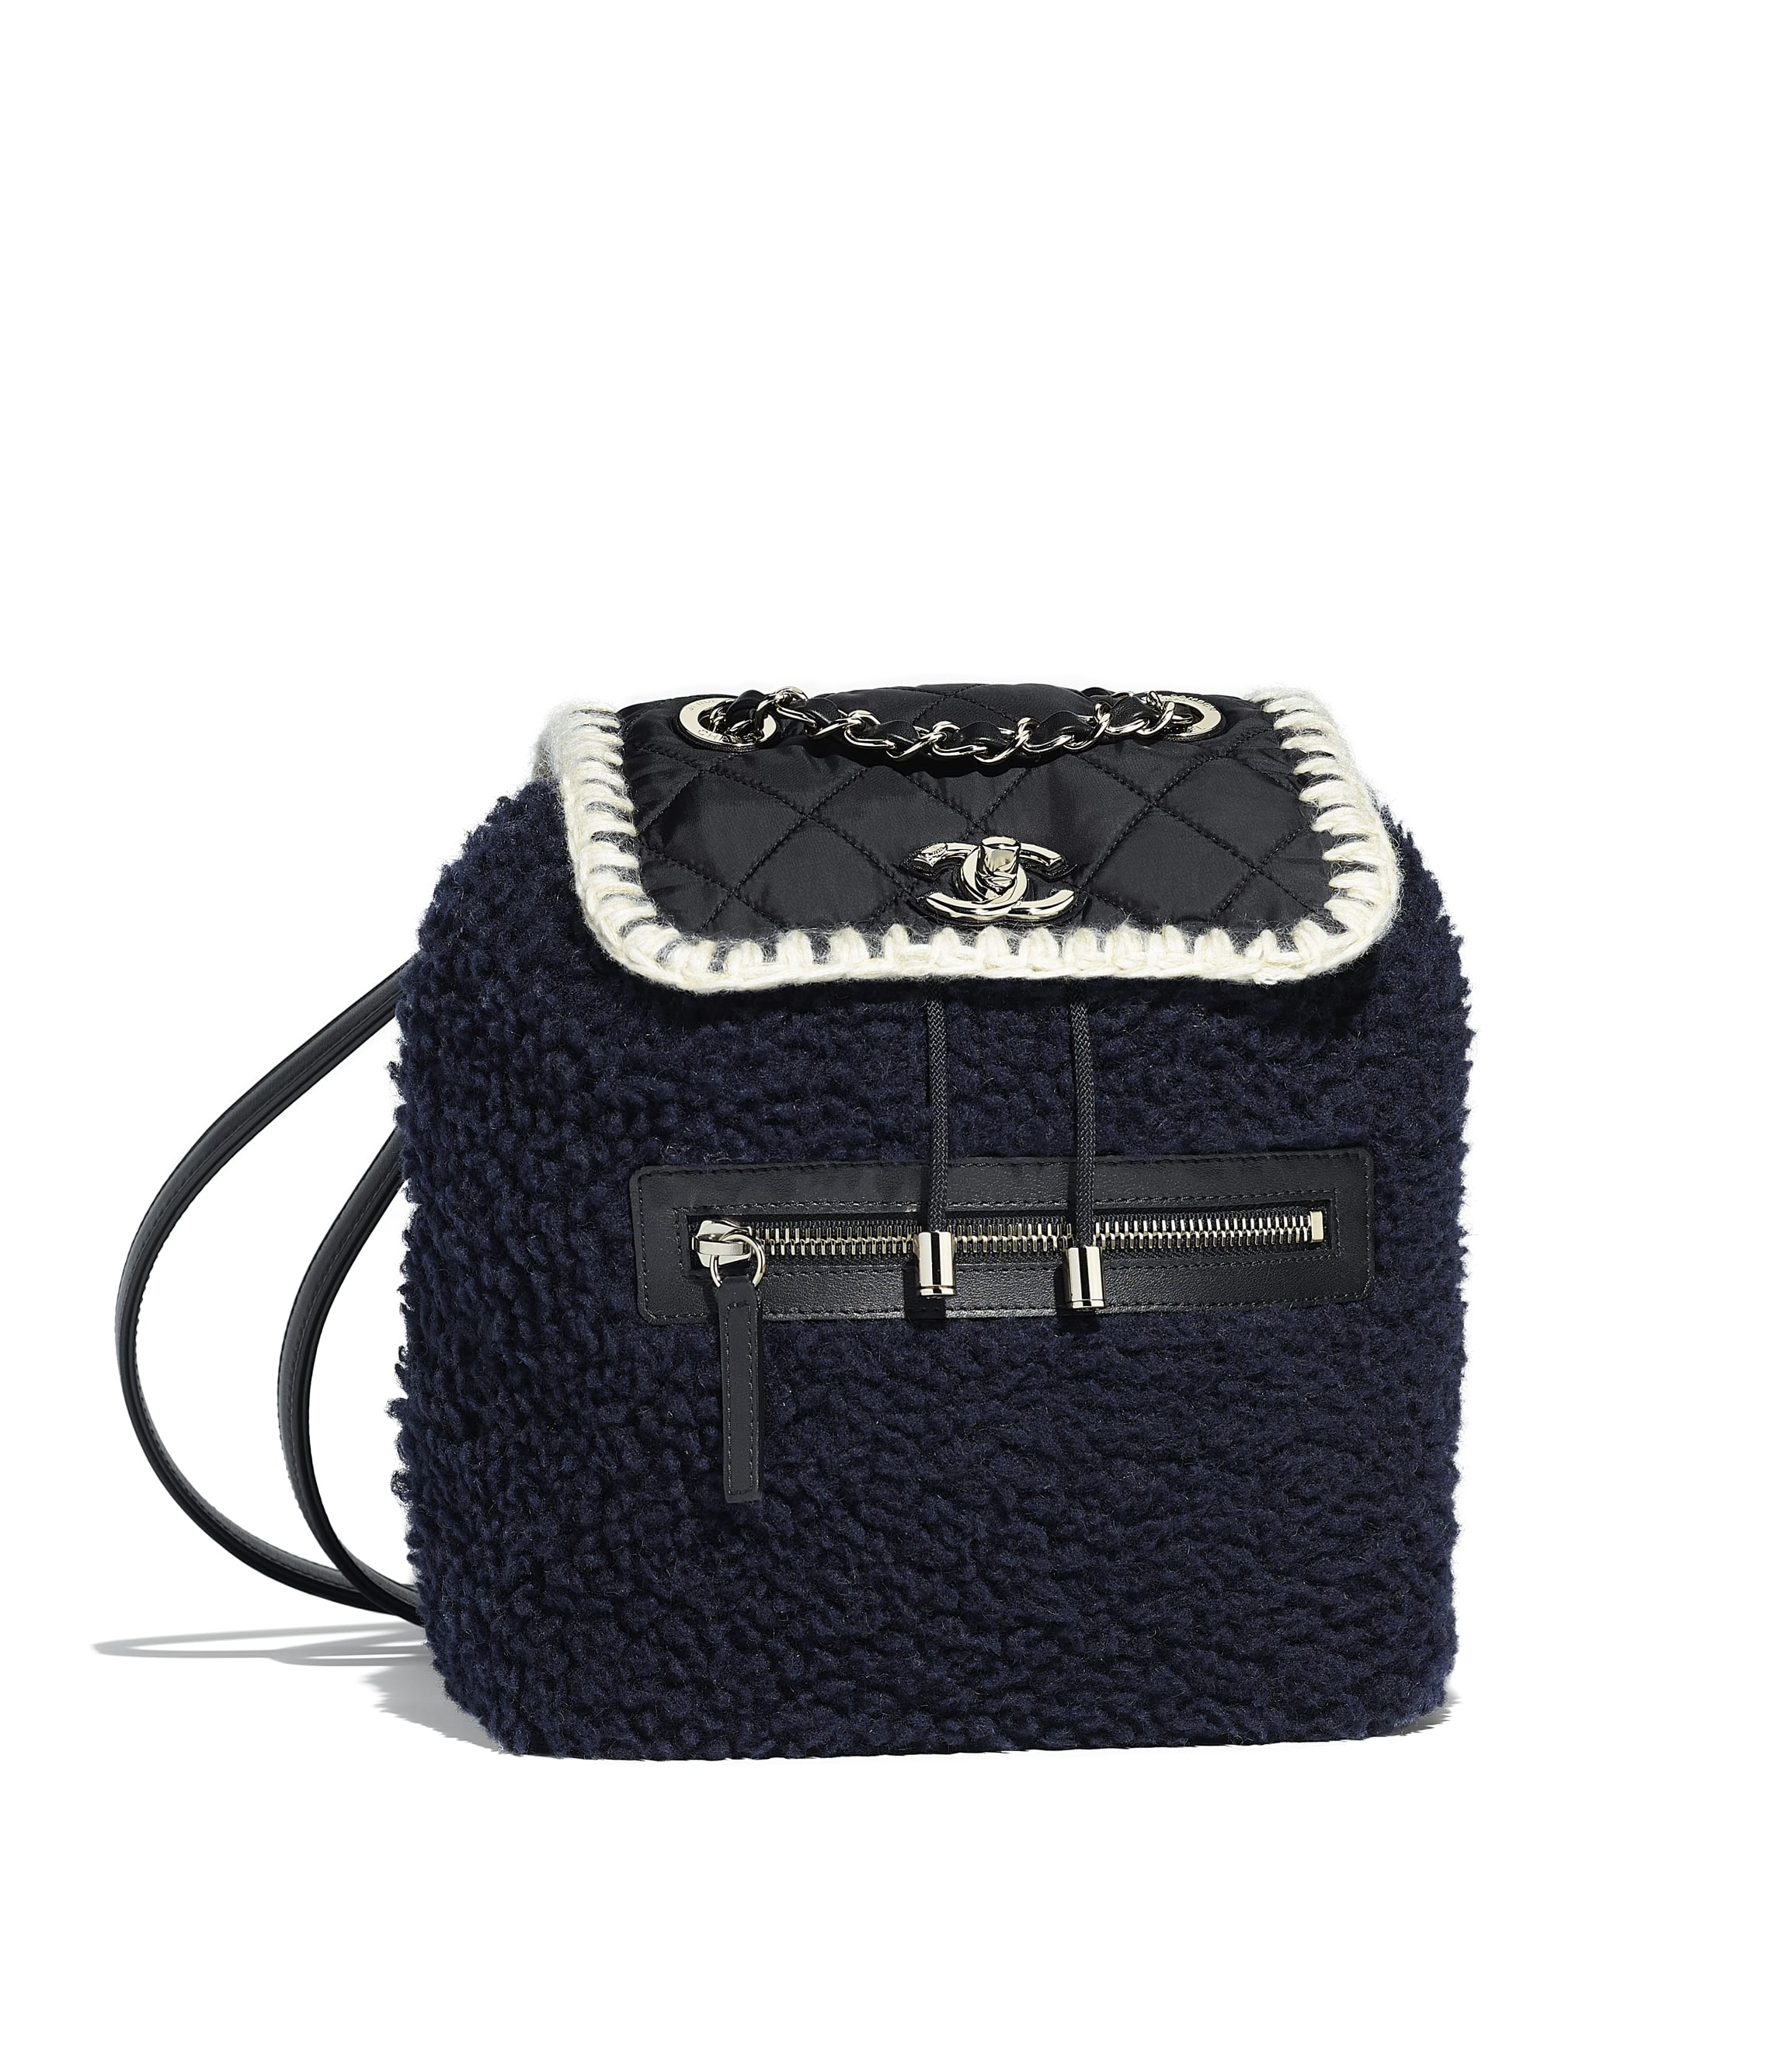 Other Handbags